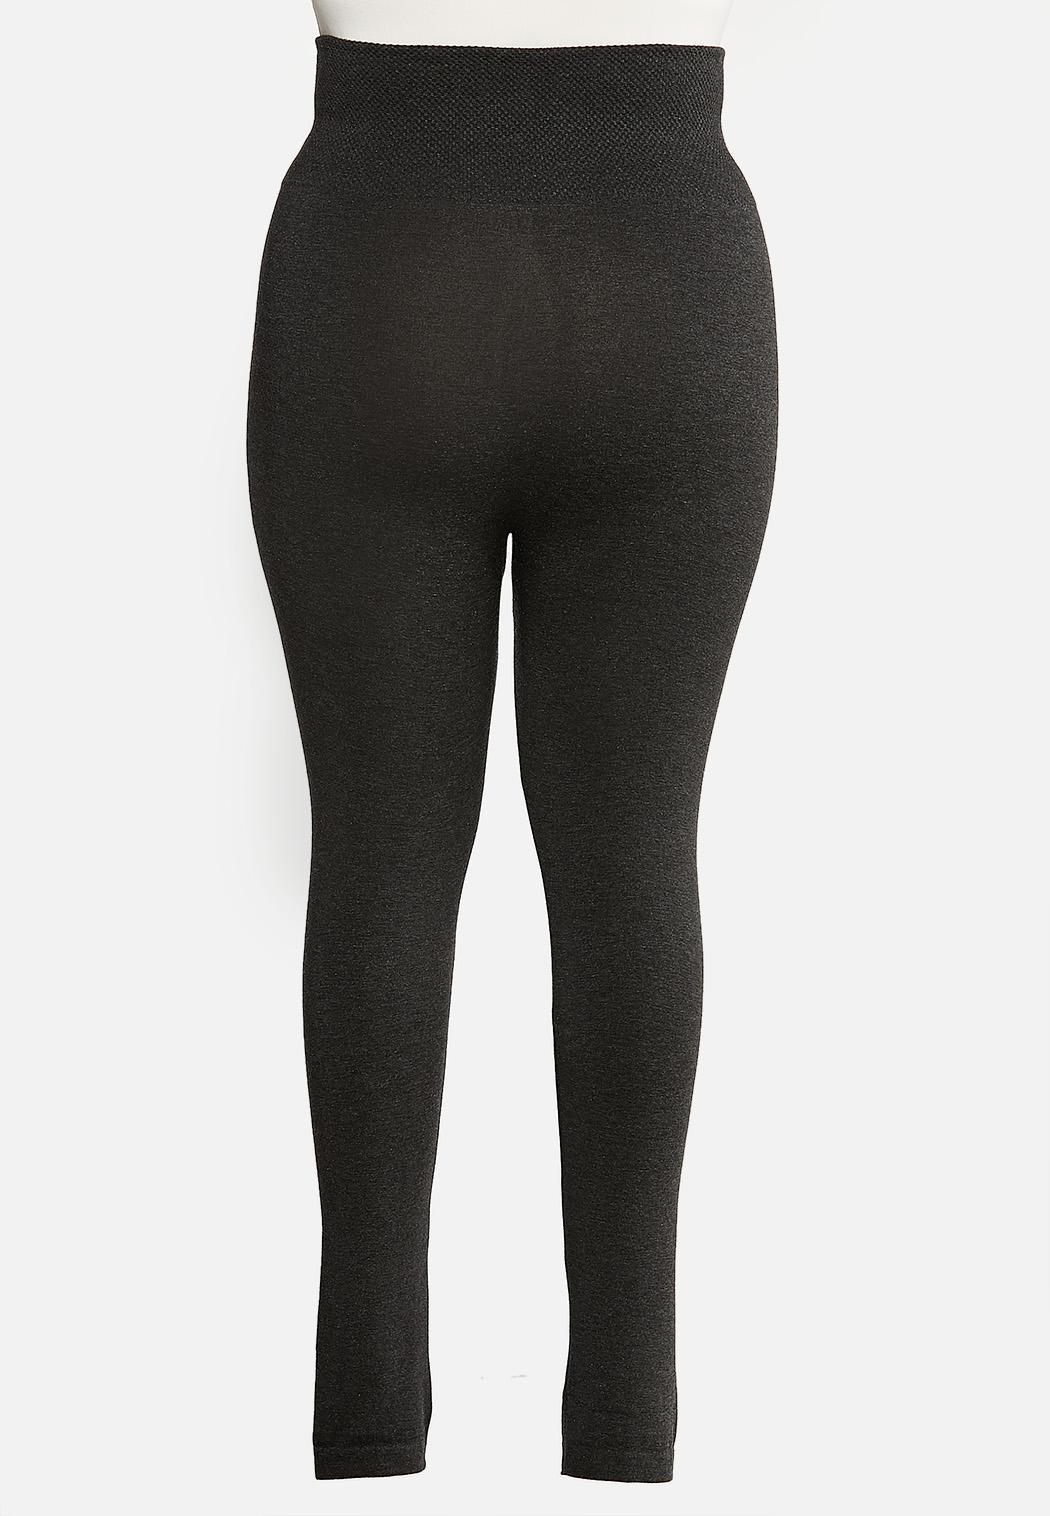 Plus Size Charcoal Fleece Leggings (Item #44184679)